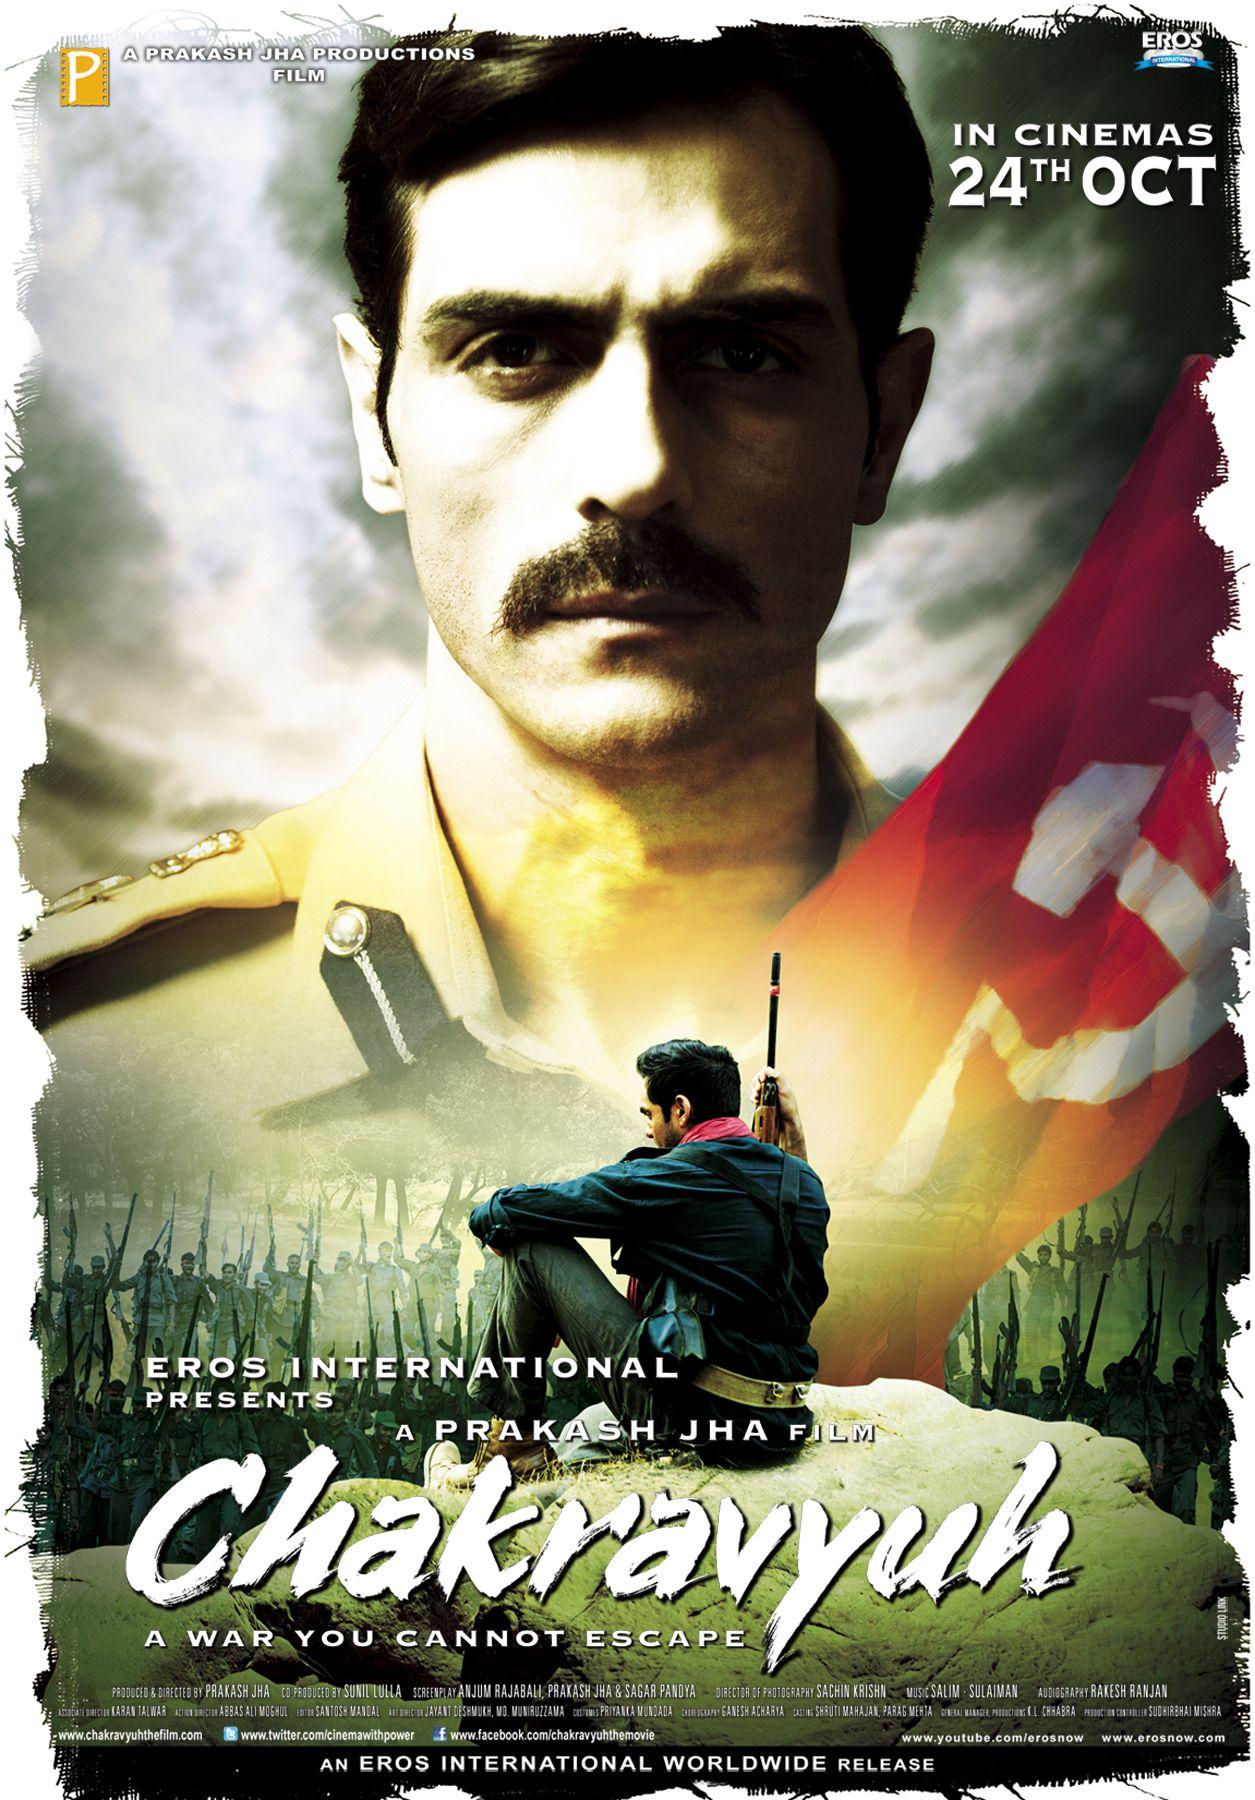 Chakravyuh (2012) Streaming movies free, Hindi movie